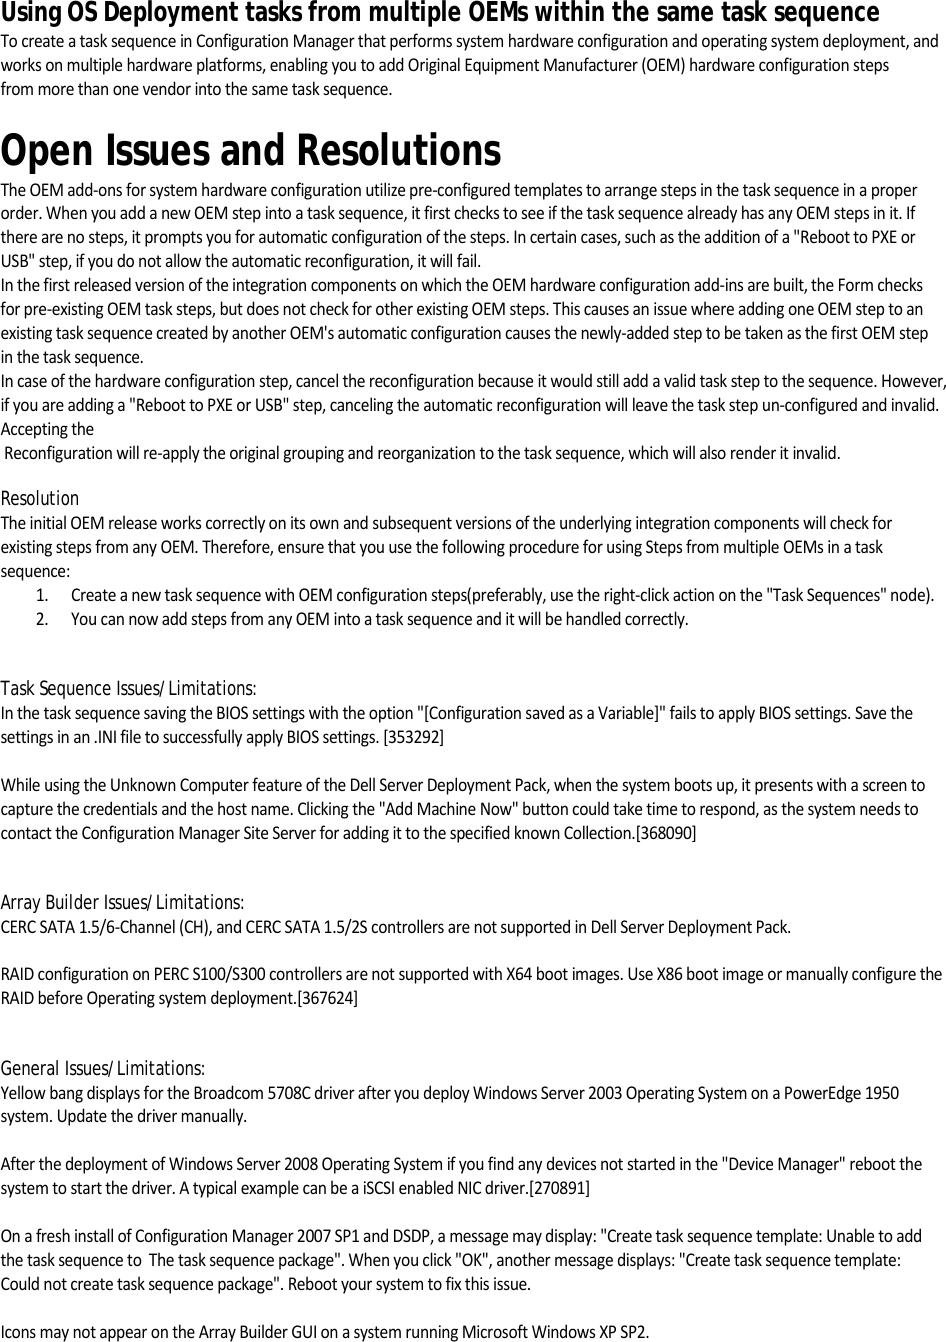 Dell Server Deployment Pack Version 2 0 For Microsoft System